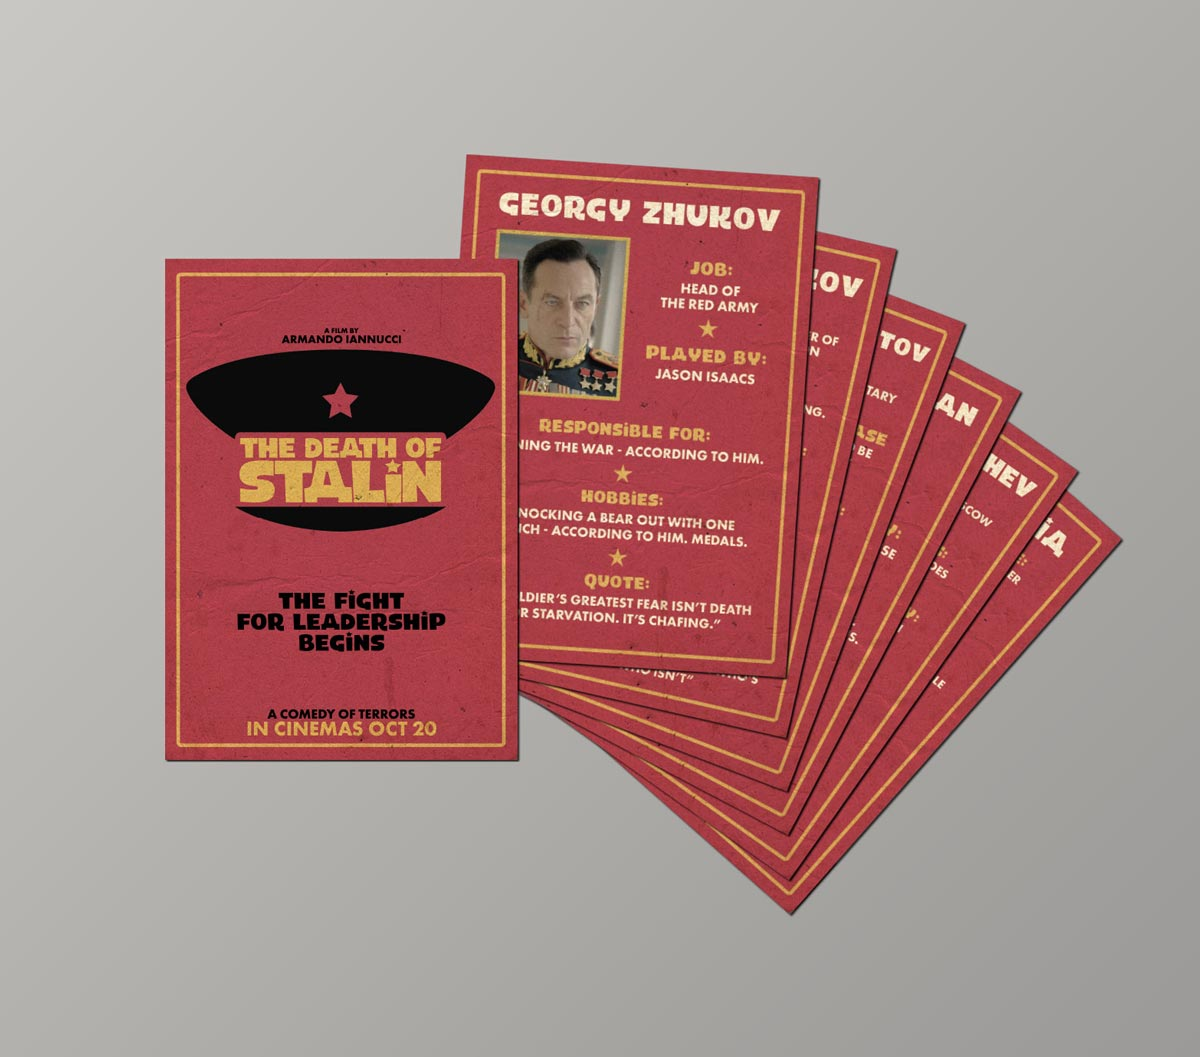 Top Trump Cards / POS / Print / Comedy /eOne